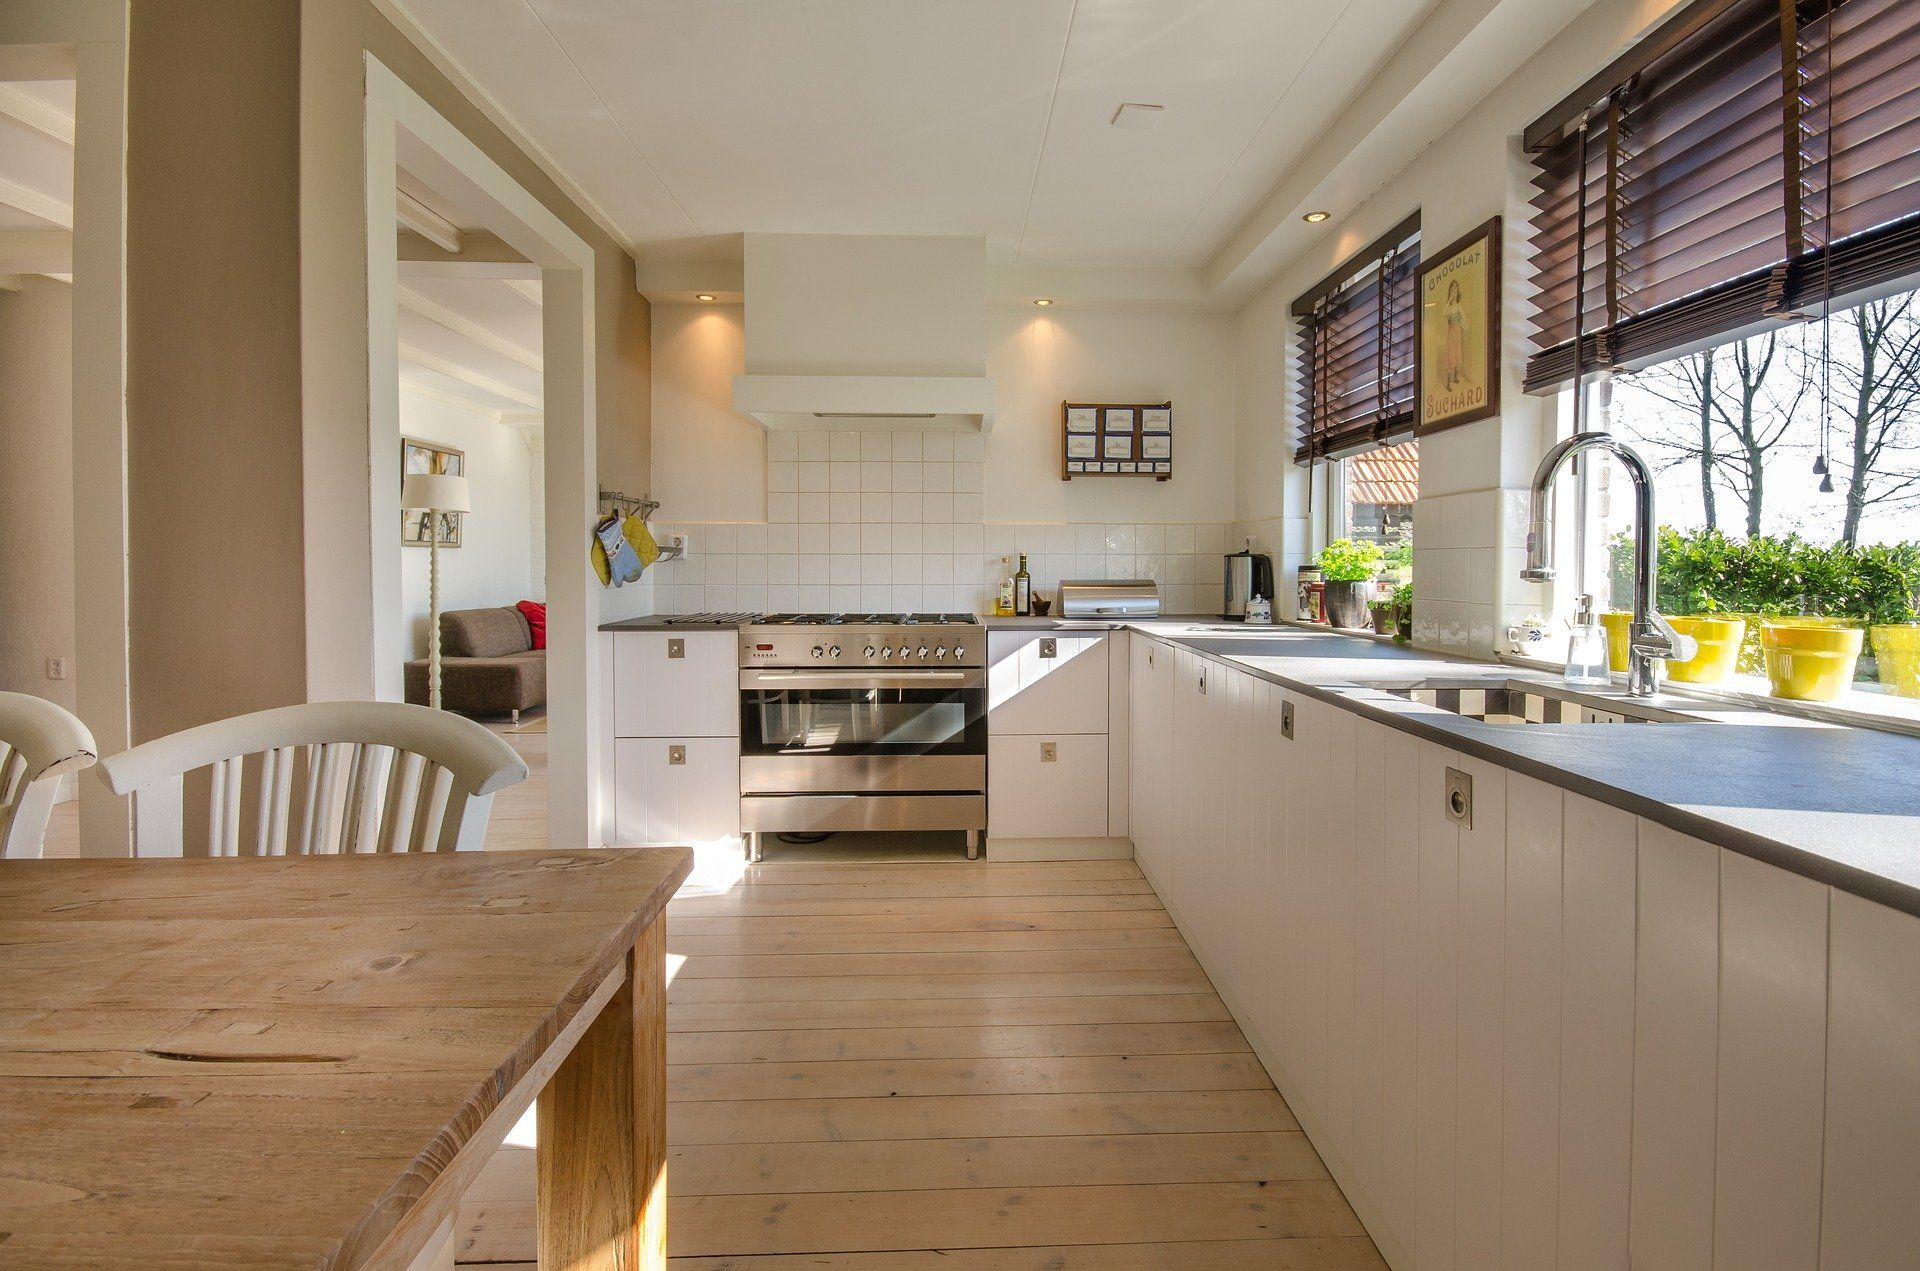 Foto de Los electrodomésticos indispensables en un hogar